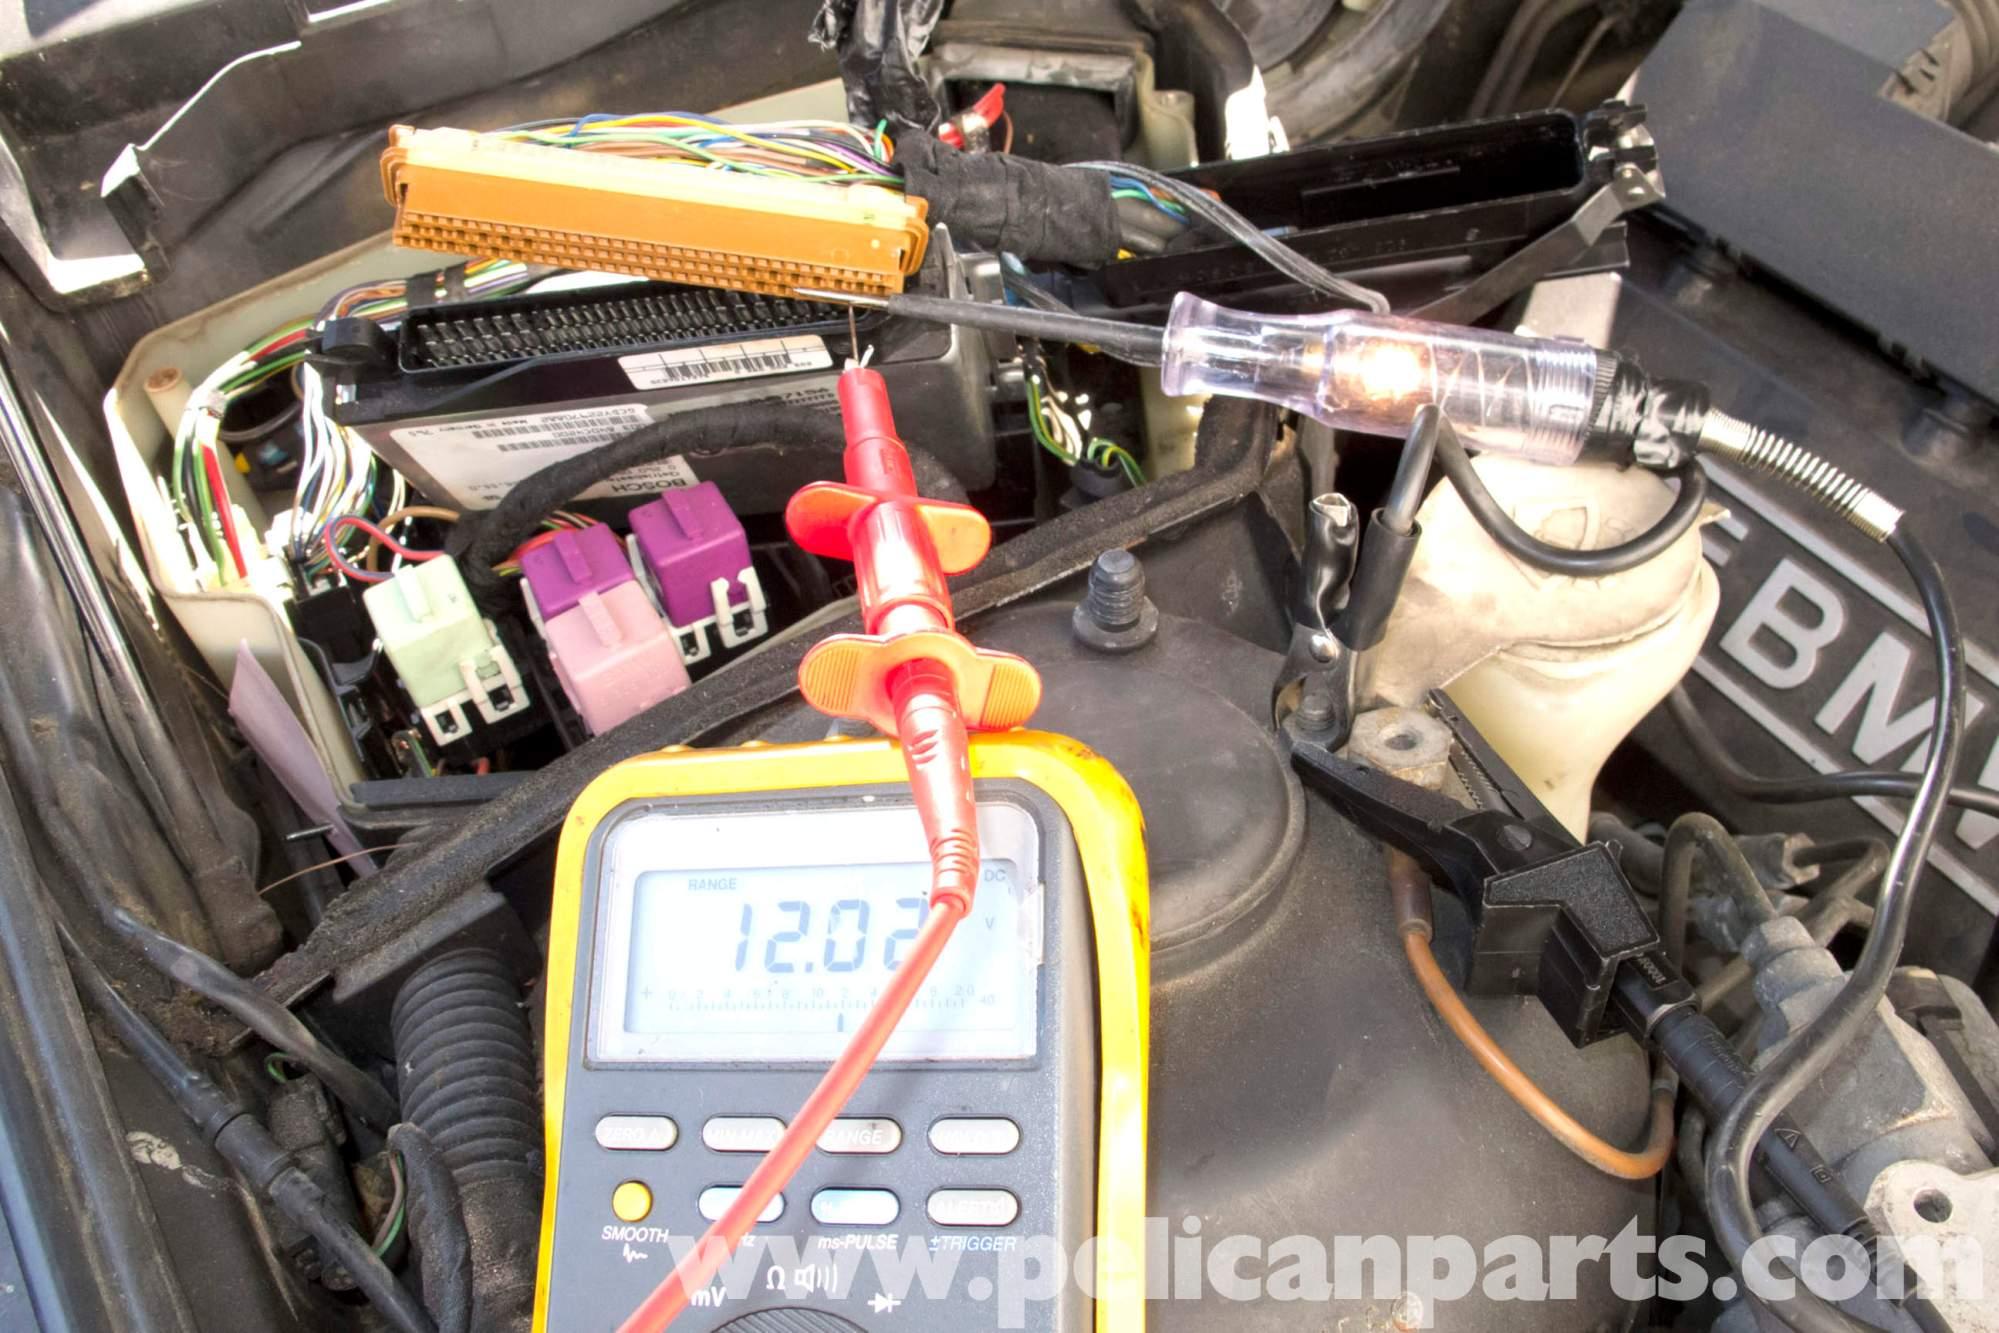 hight resolution of bmw e39 5 series transmission fail safe 1997 2003 525i 528i 530i bmw 525i manual transmission diagrams